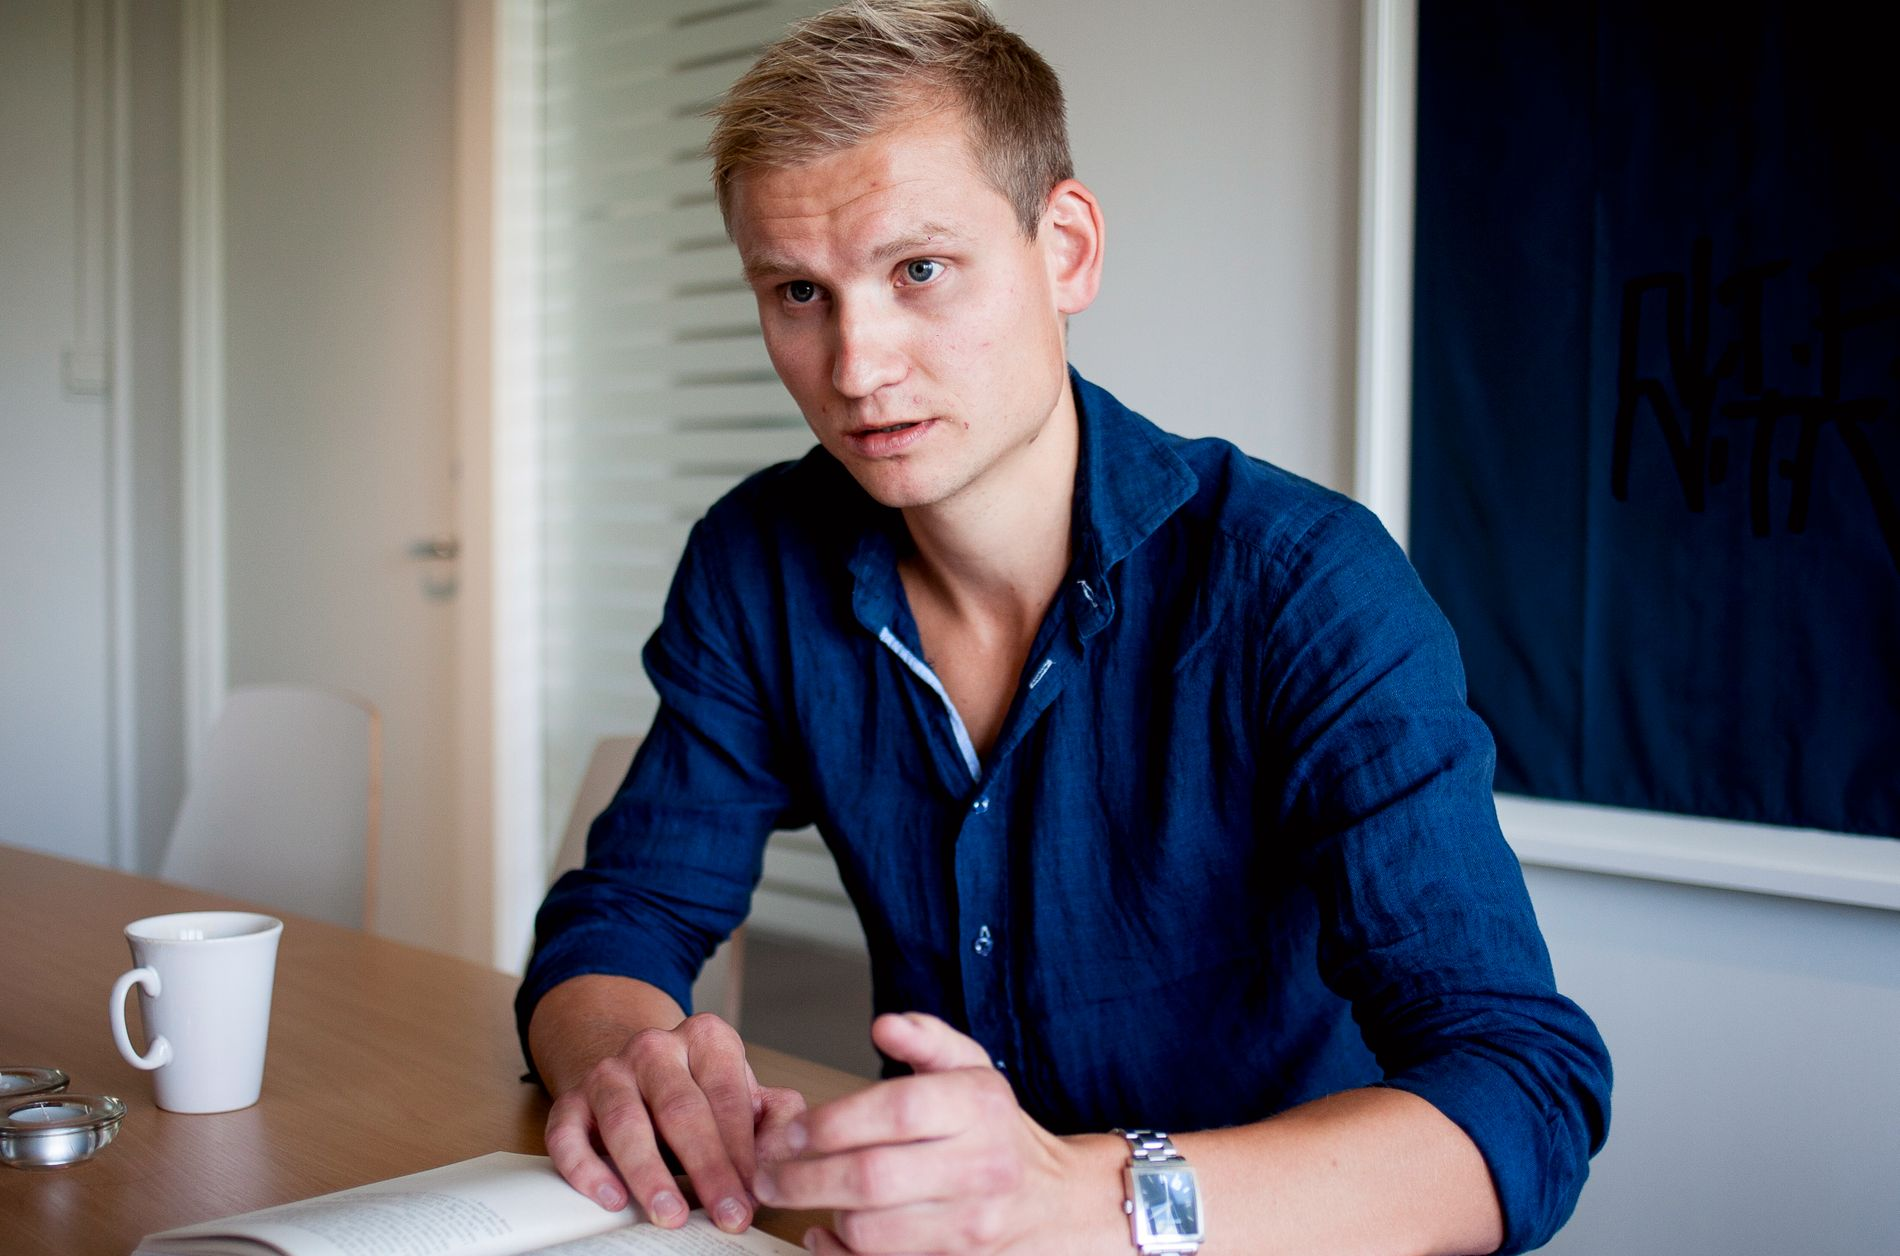 KOMMENTATOR: Adresseavisens Birger Løfaldli fulgte pressetreffet i Molde tirsdag. Her fra en tidligere anledning.